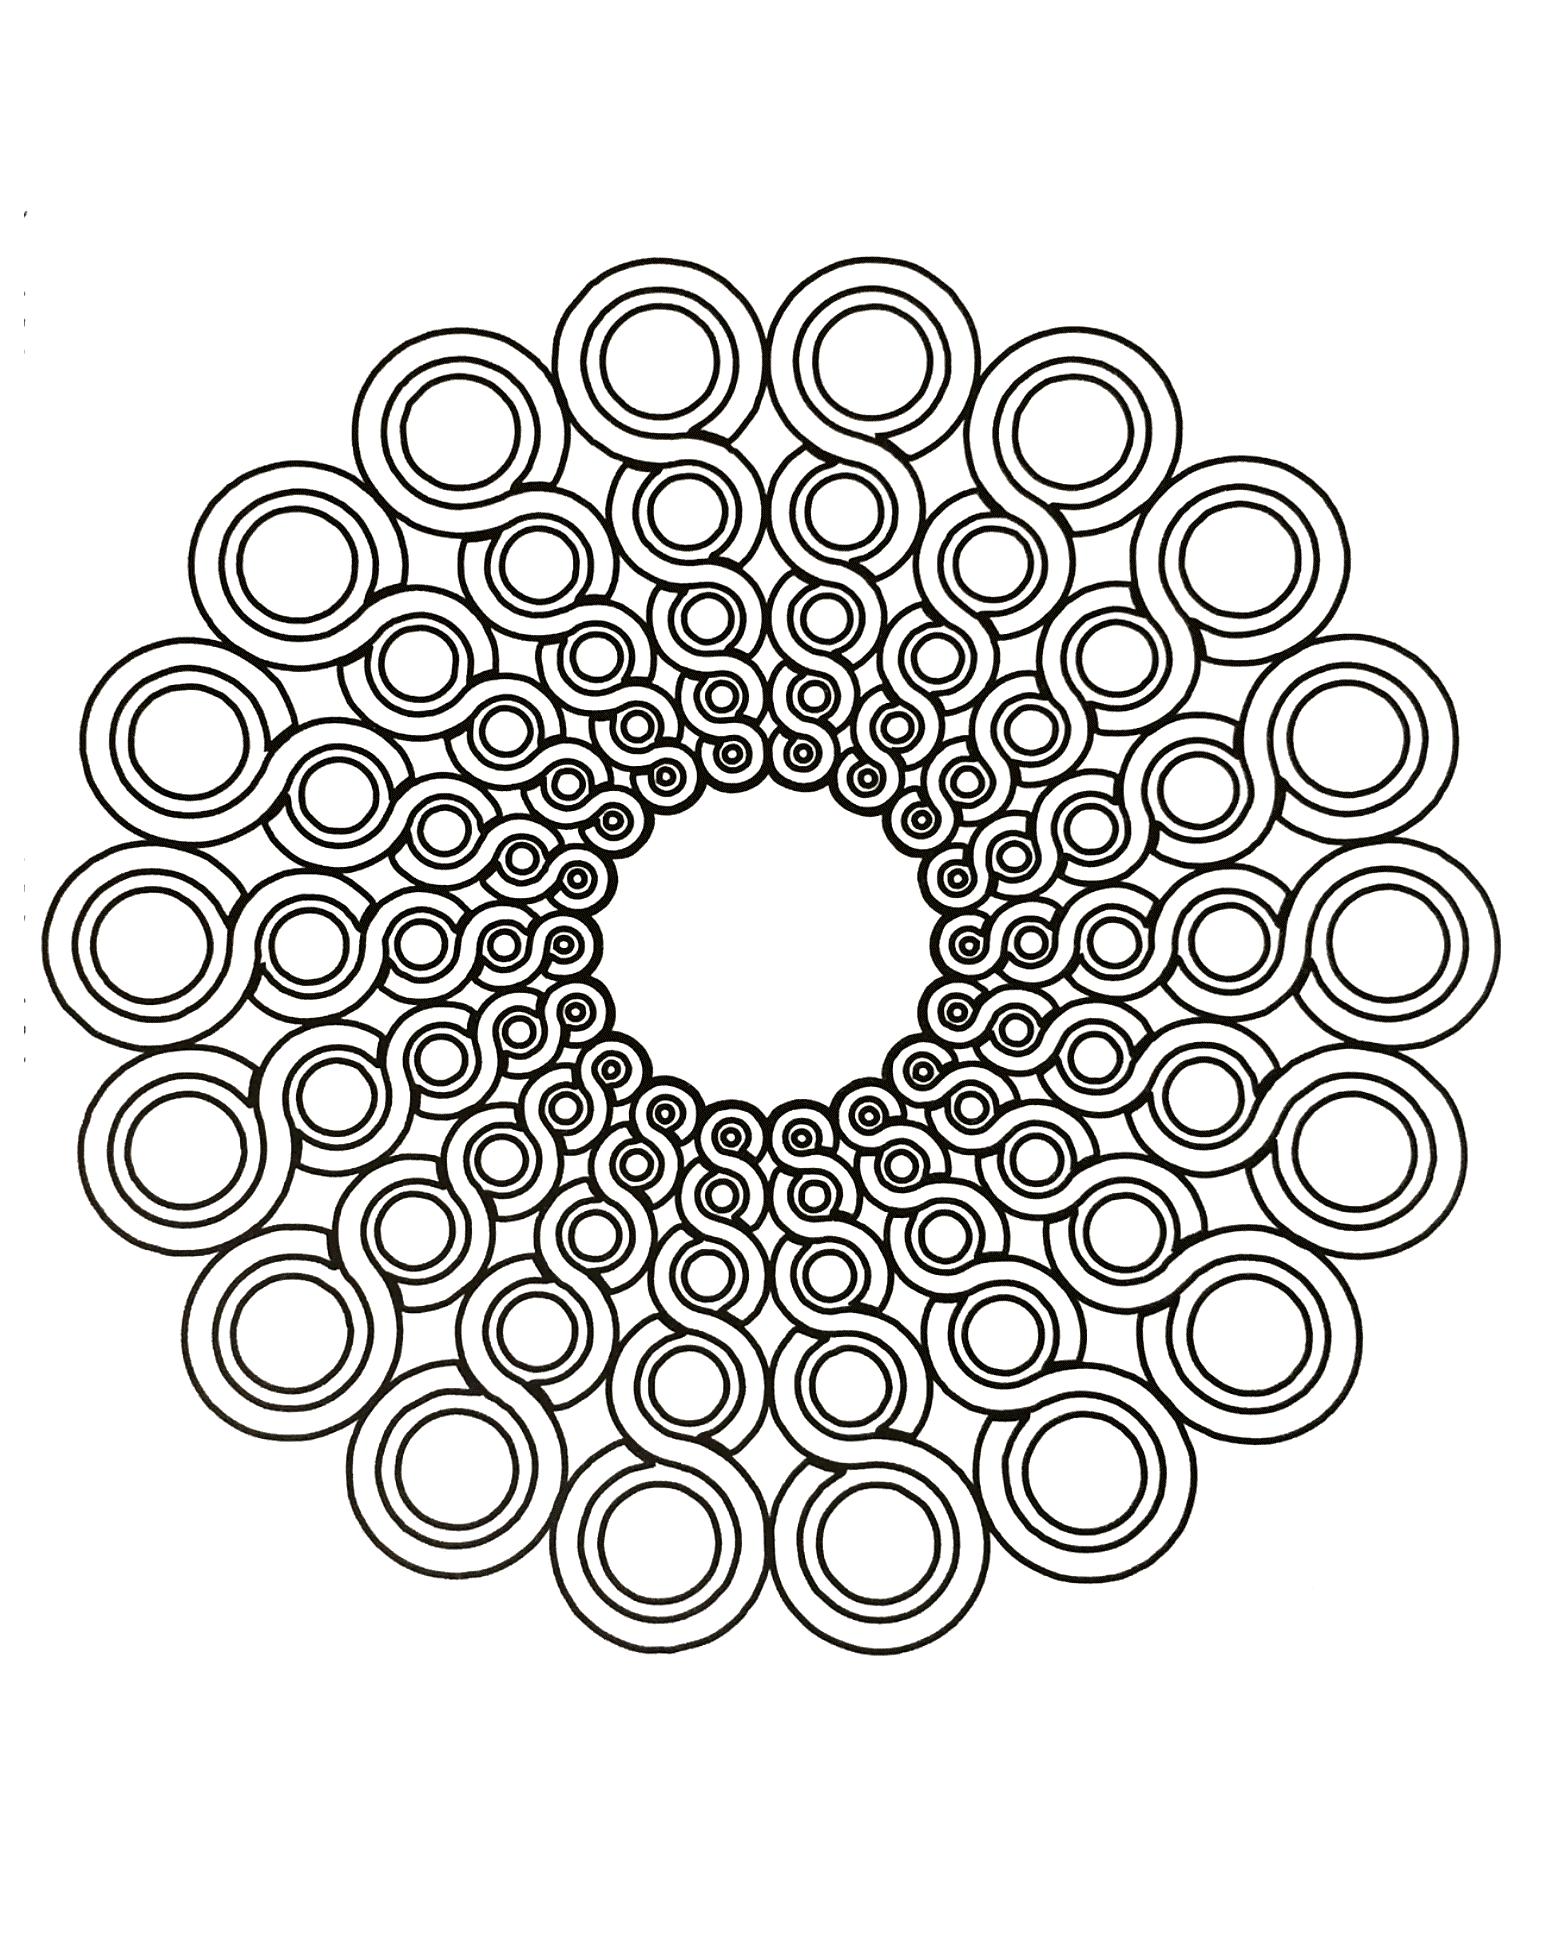 Facile mandala circulaire coloriage mandalas - Coloriages mandalas ...